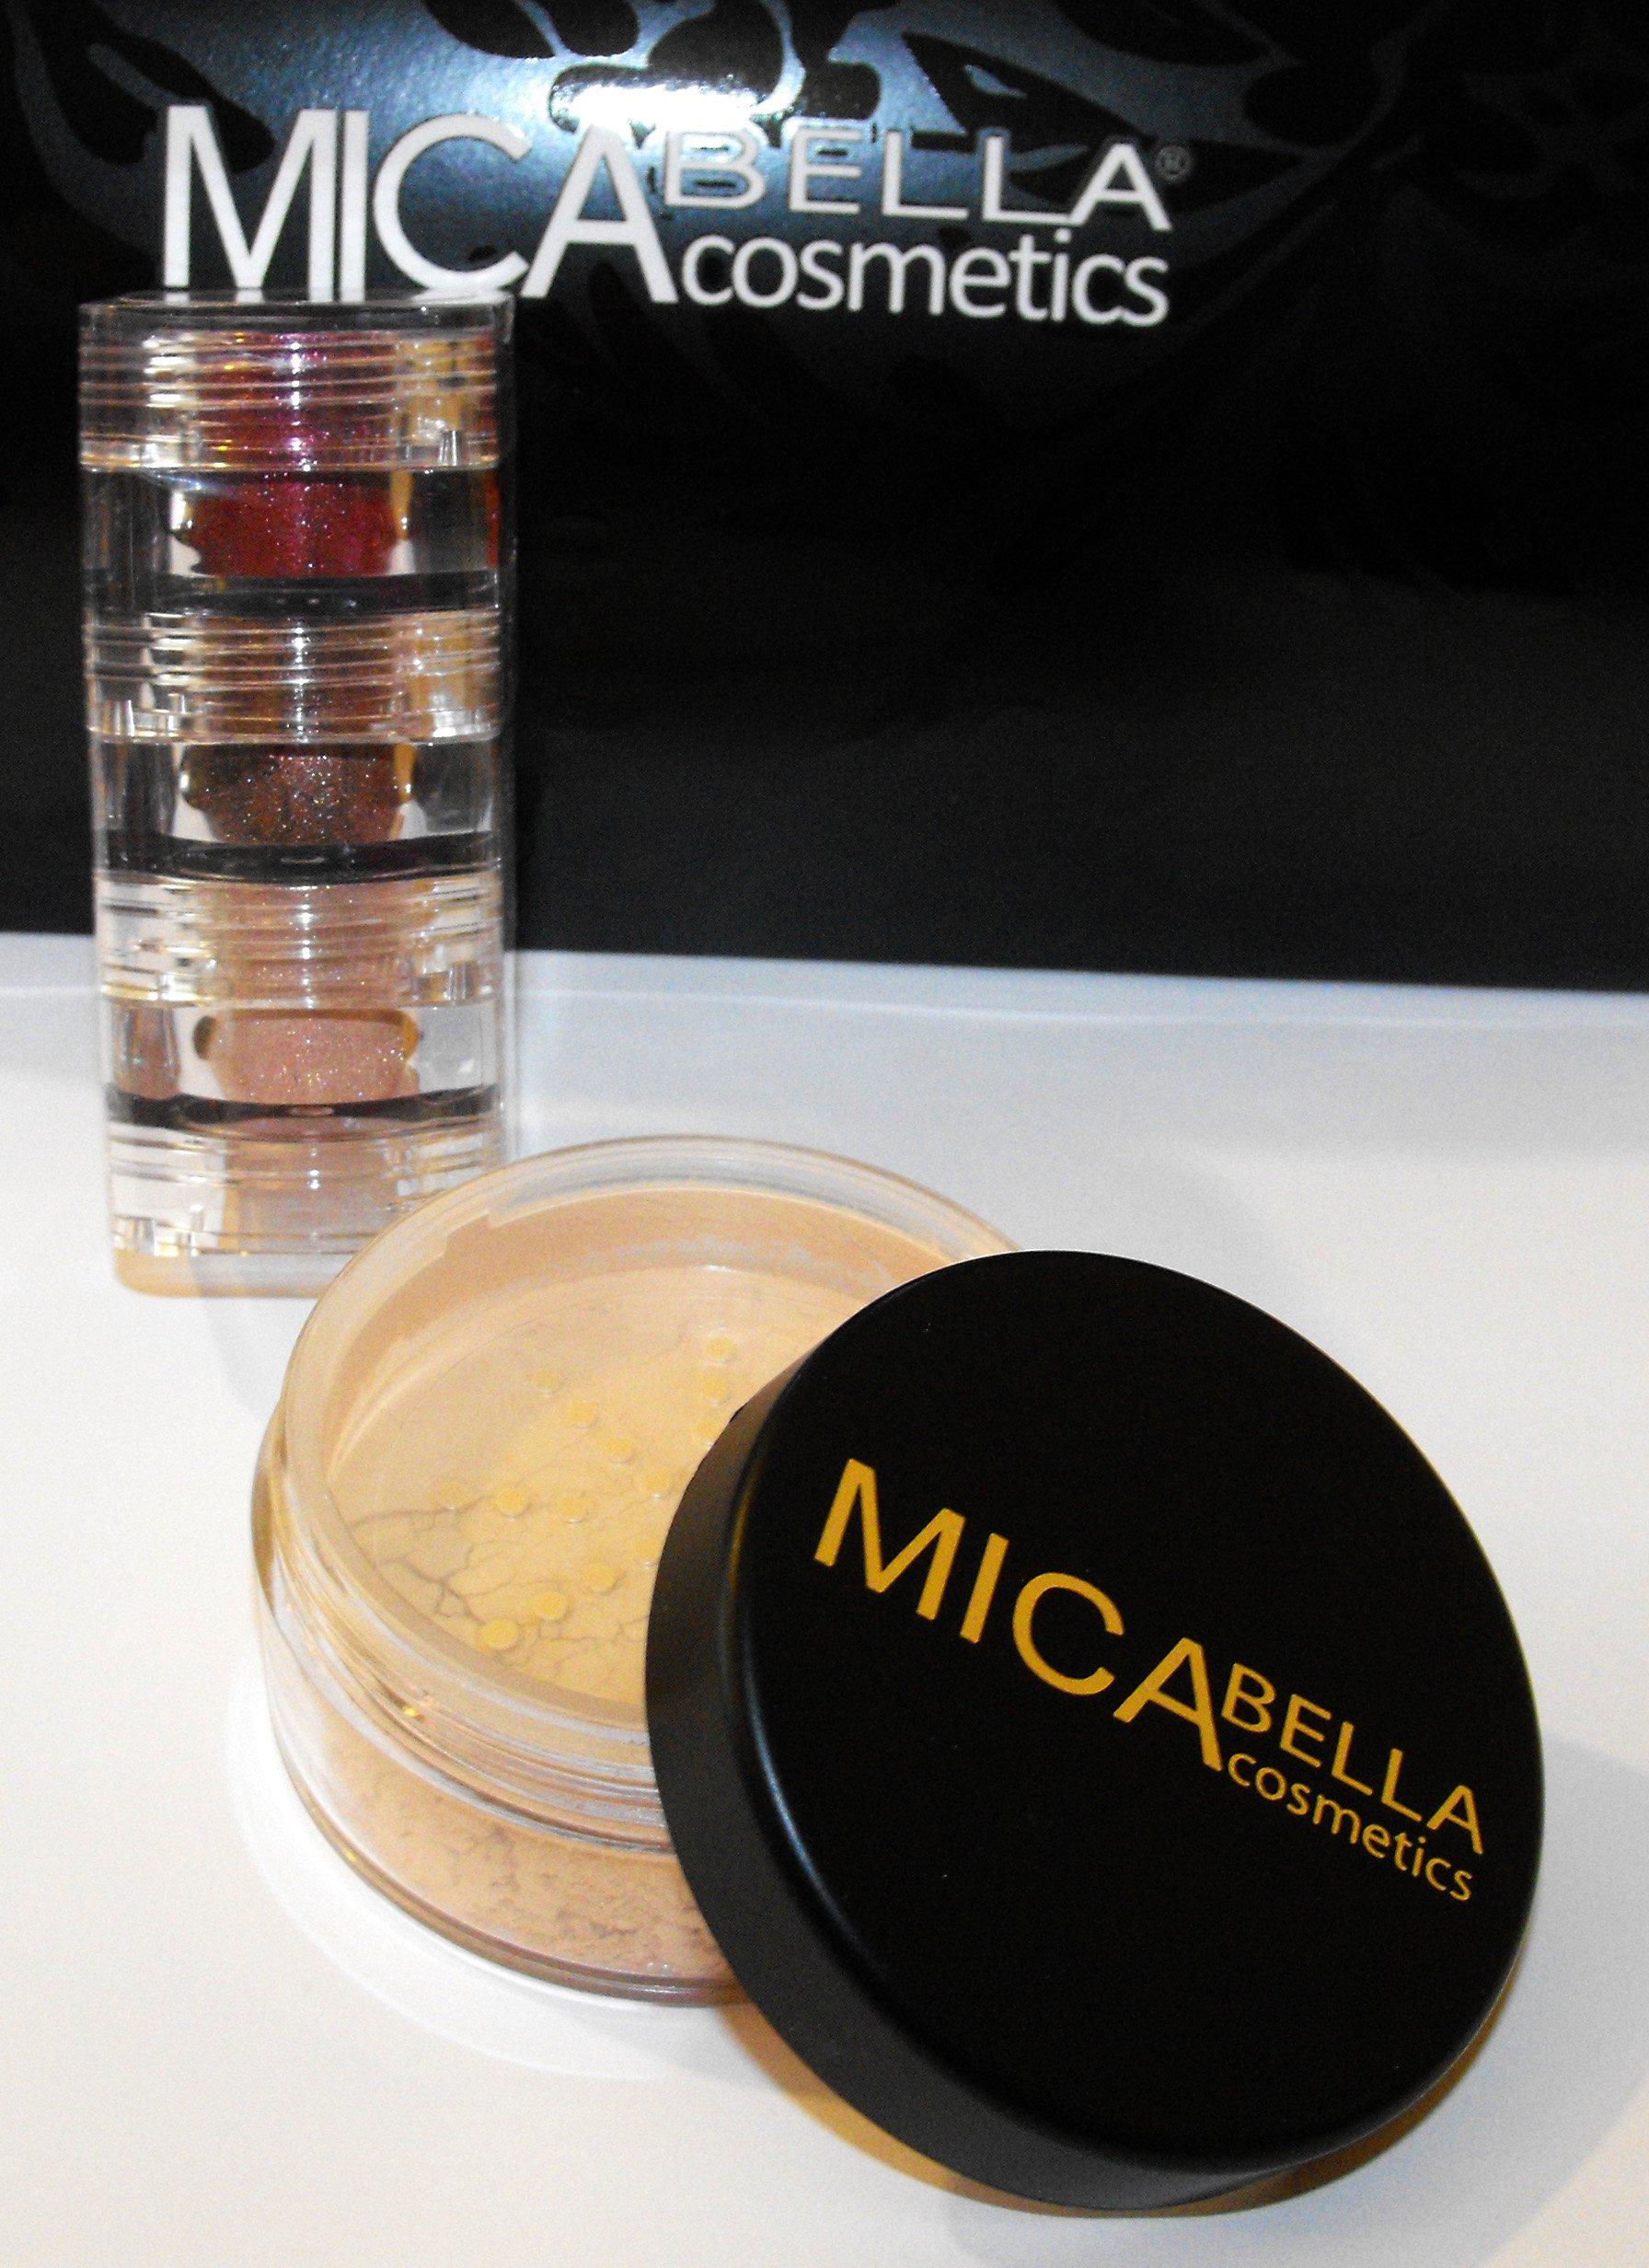 Mica Beauty Mineral Foundation Mf5 ''Cappuccino''+3stacks Shimmer''a-viva Green Eyes'' Shimmer Eye Shadow